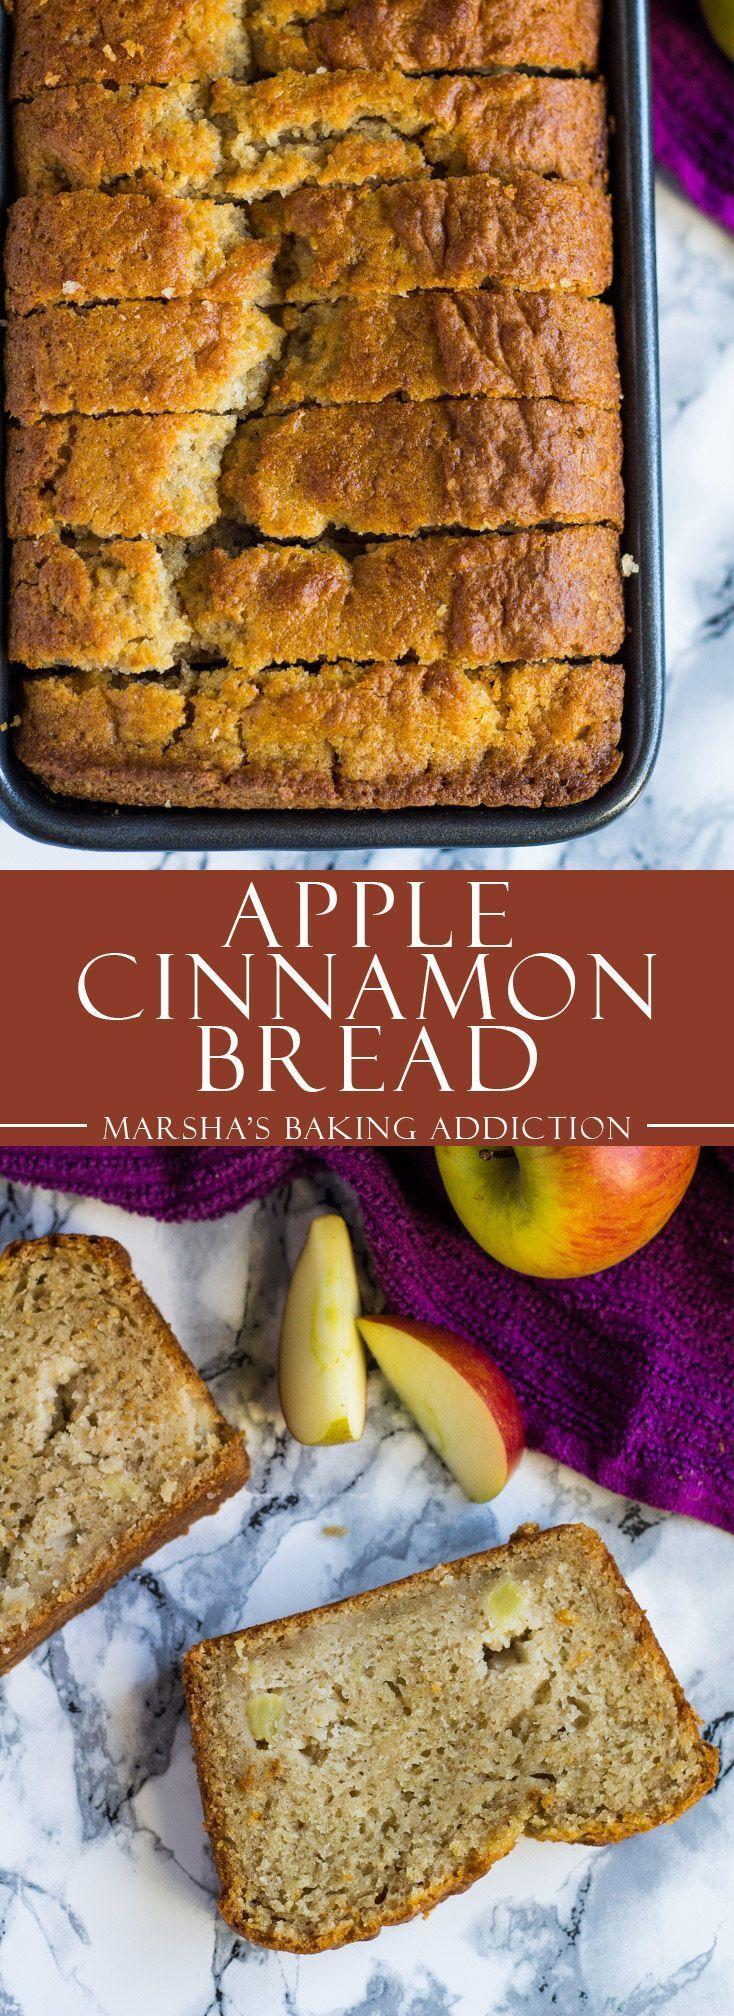 Apple Cinnamon Bread | http://marshasbakingaddiction.com /marshasbakeblog/